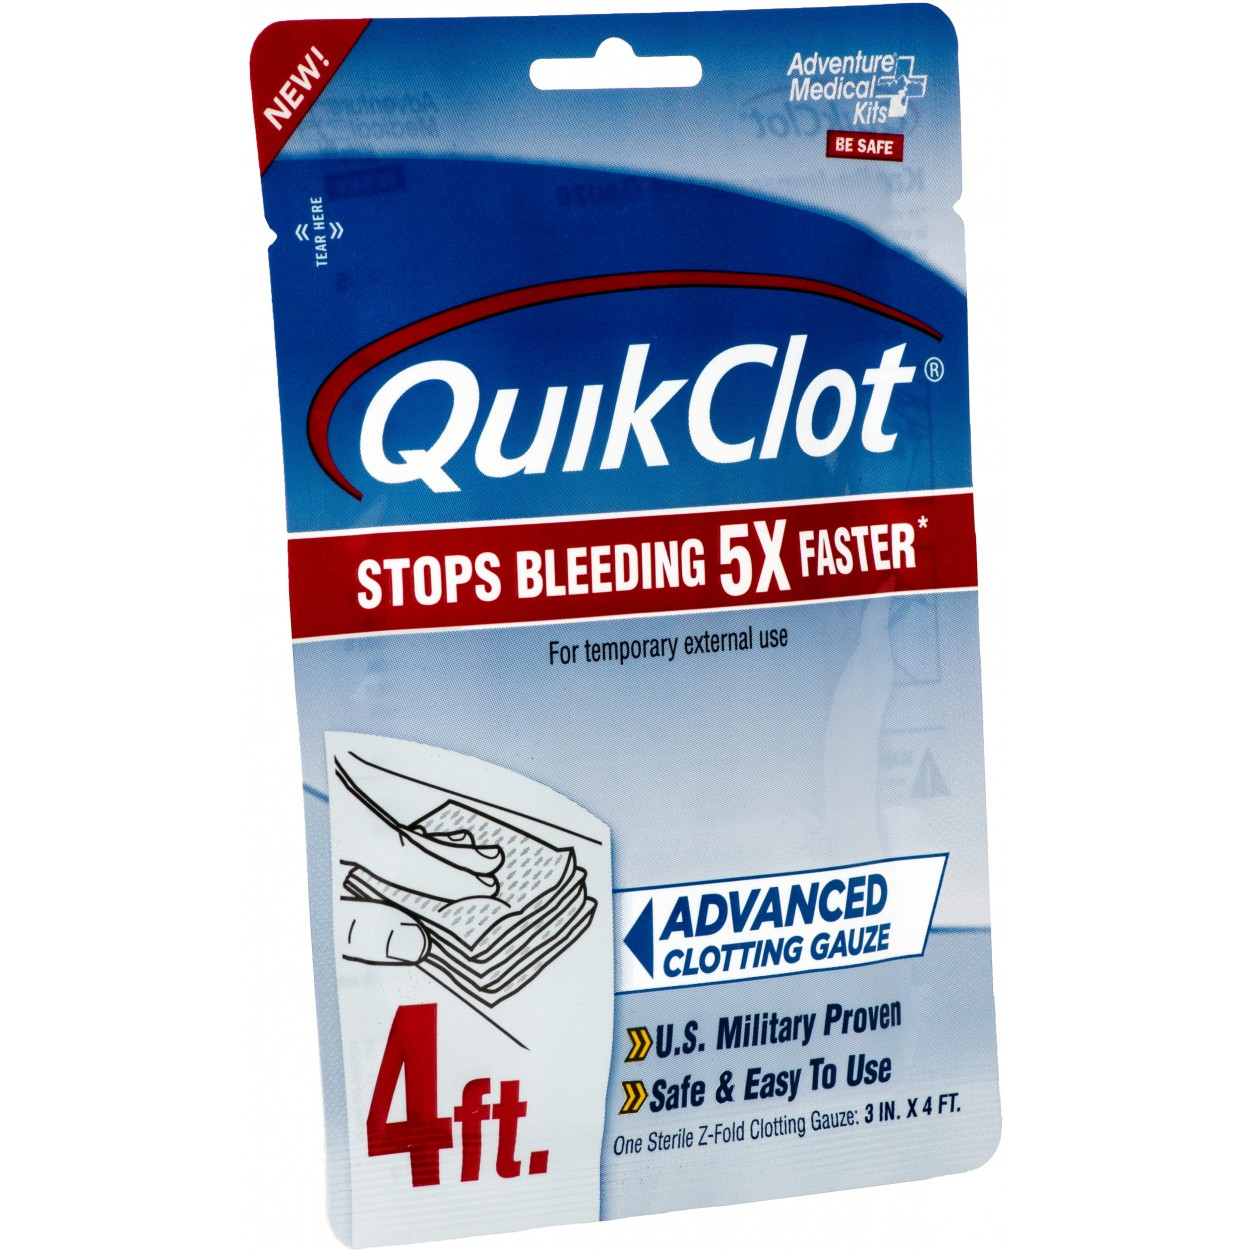 Quick Clot Stops Bleeding Fast! QuikClot Trauma Pack